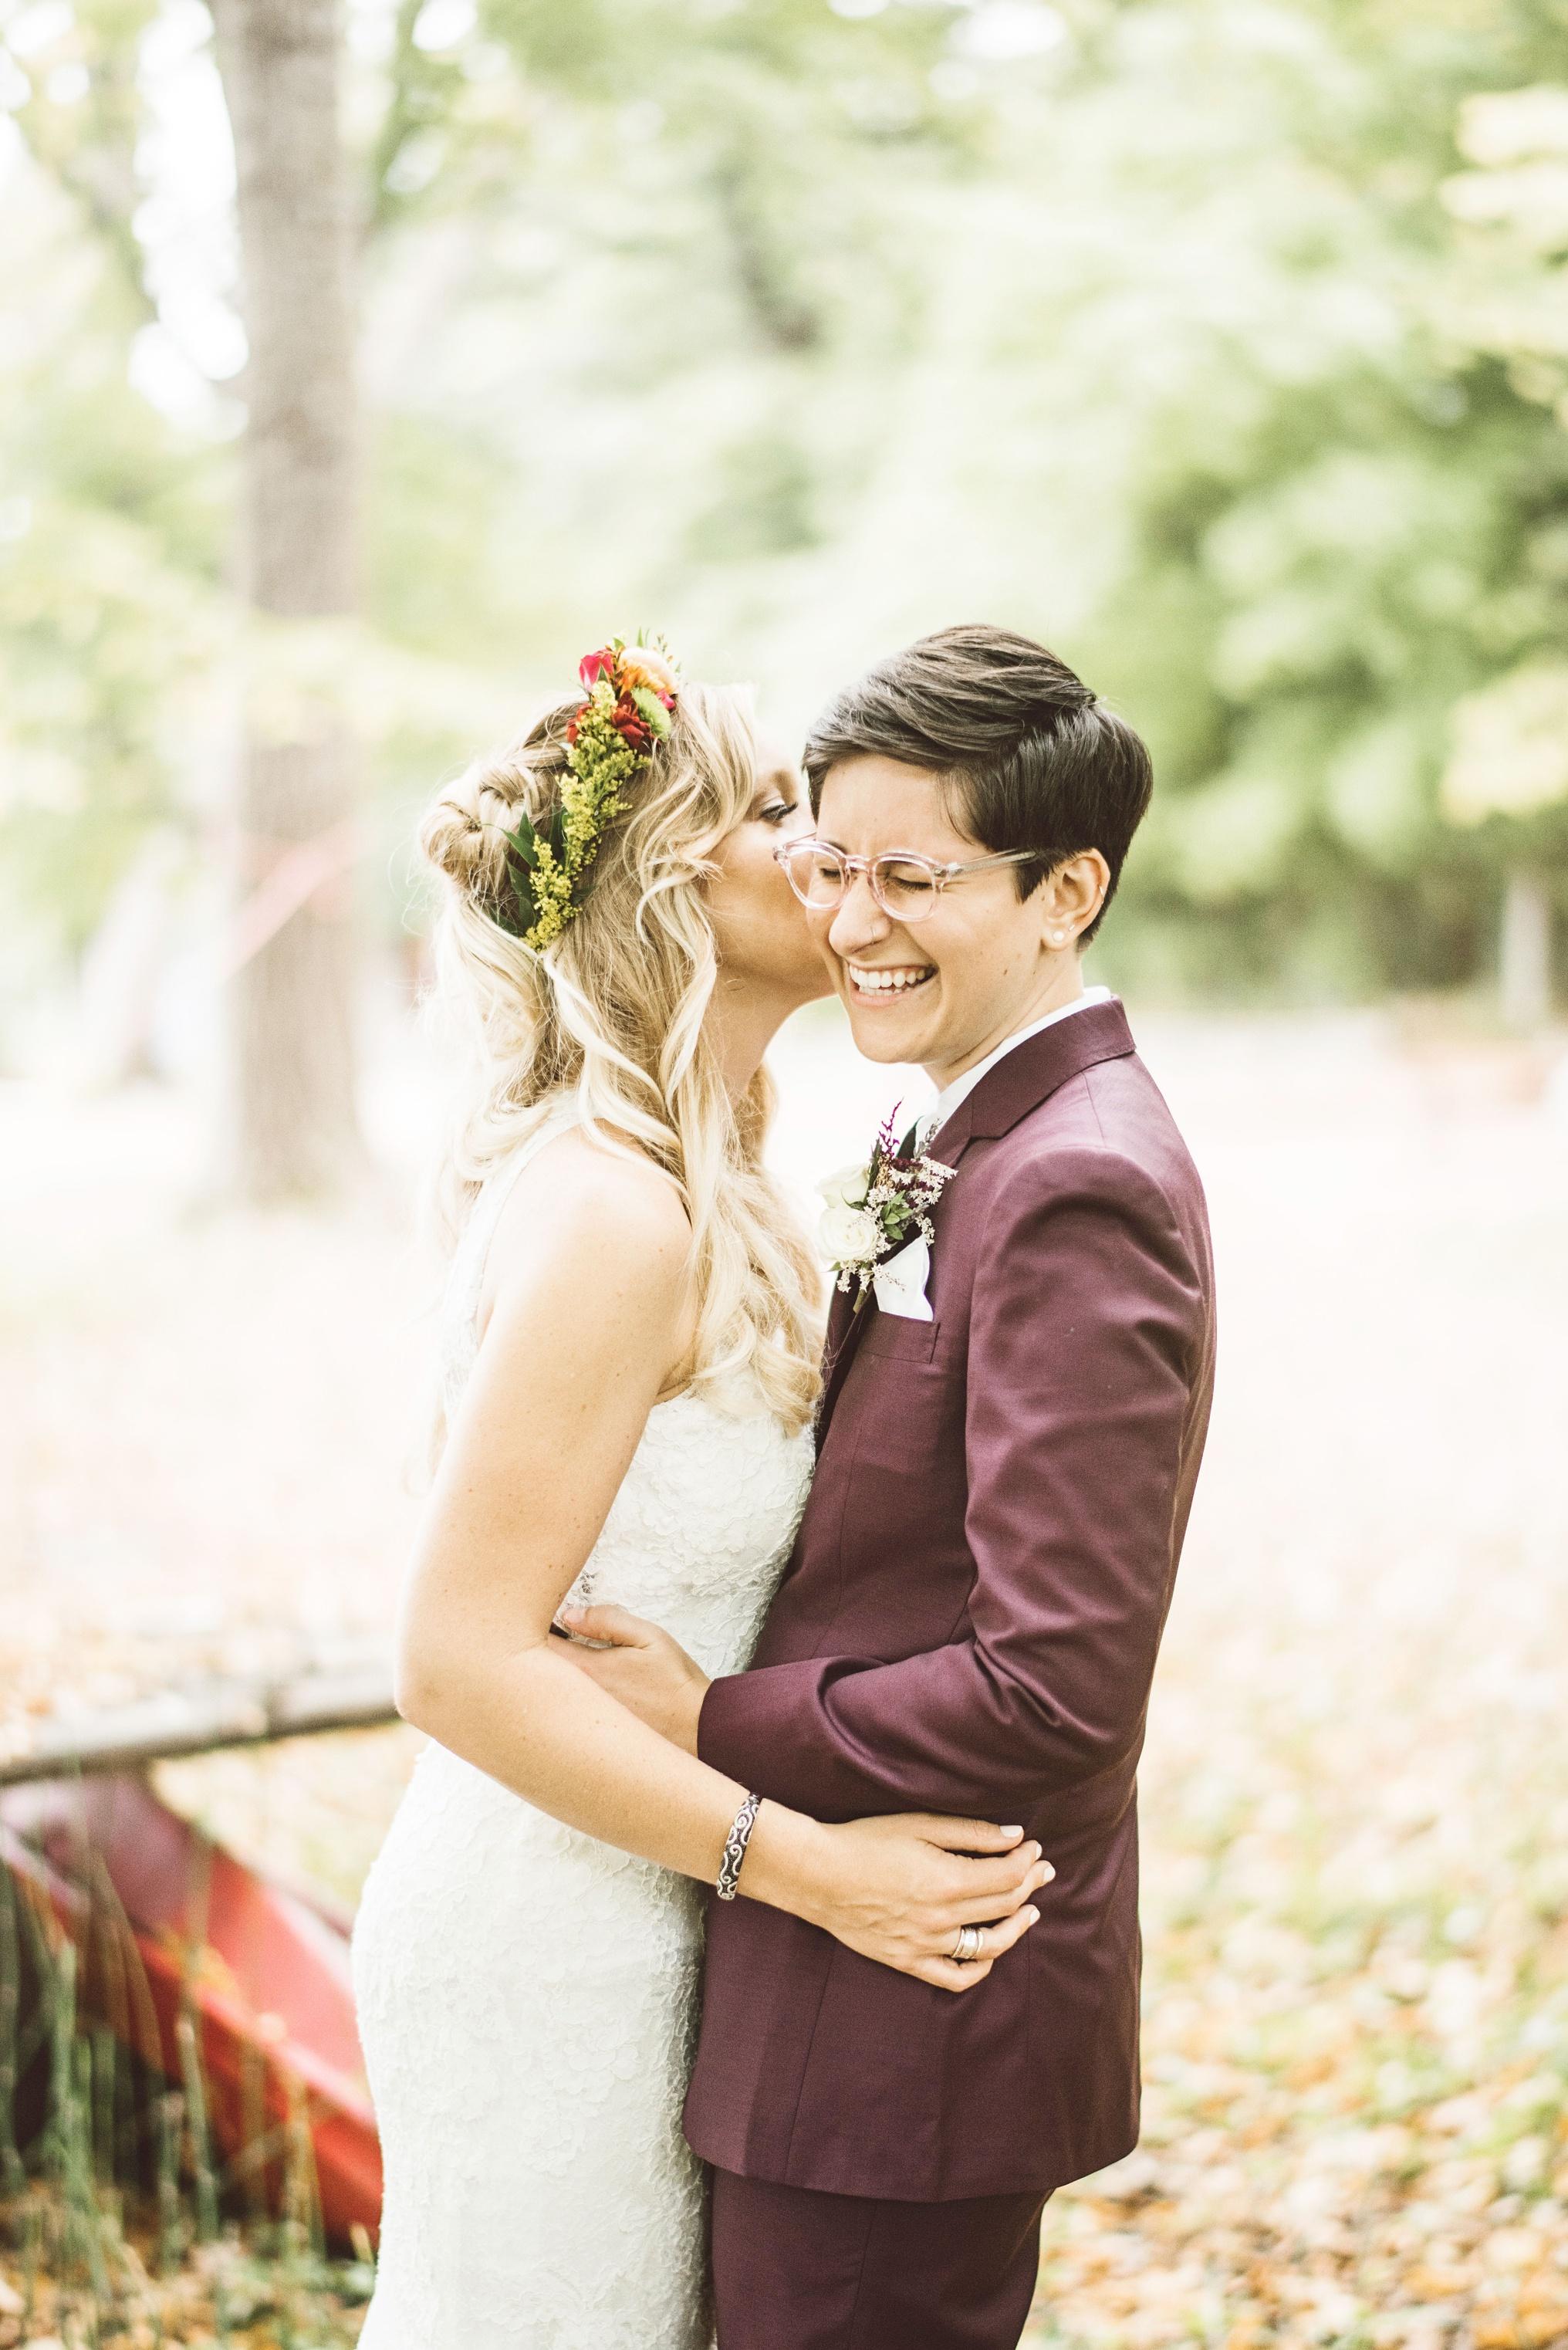 best_wedding_photography_2017_by_lucas_botz_photography_239.jpg